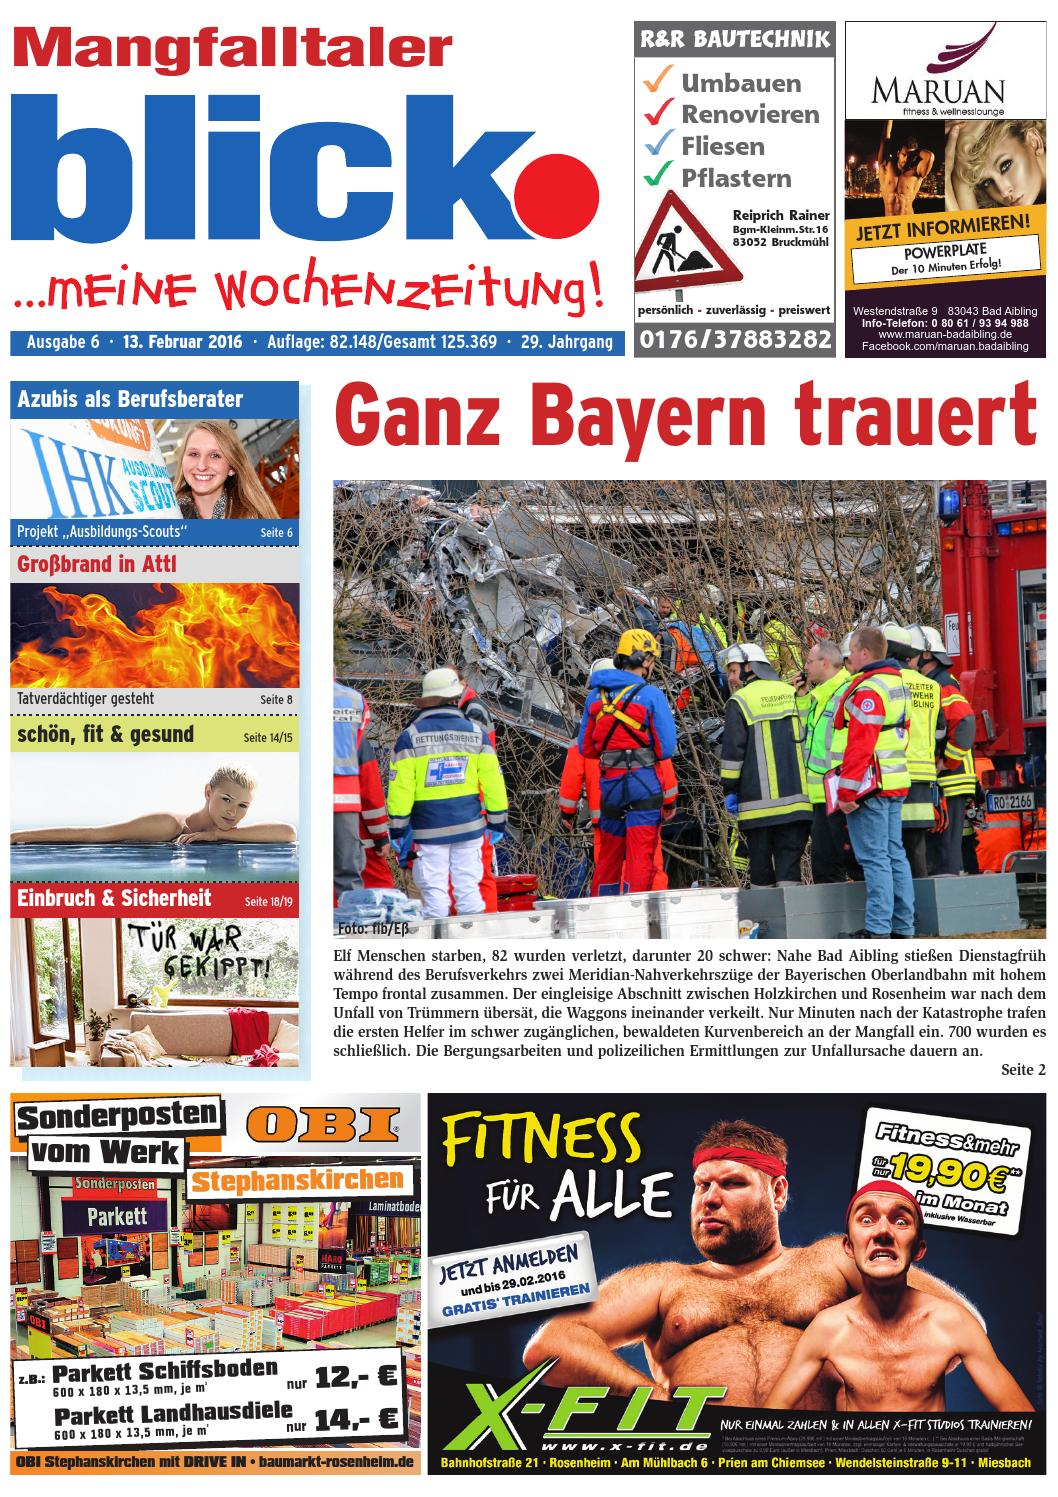 Mangfalltaler blick - Ausgabe 06   2016 by Blickpunkt Verlag - issuu